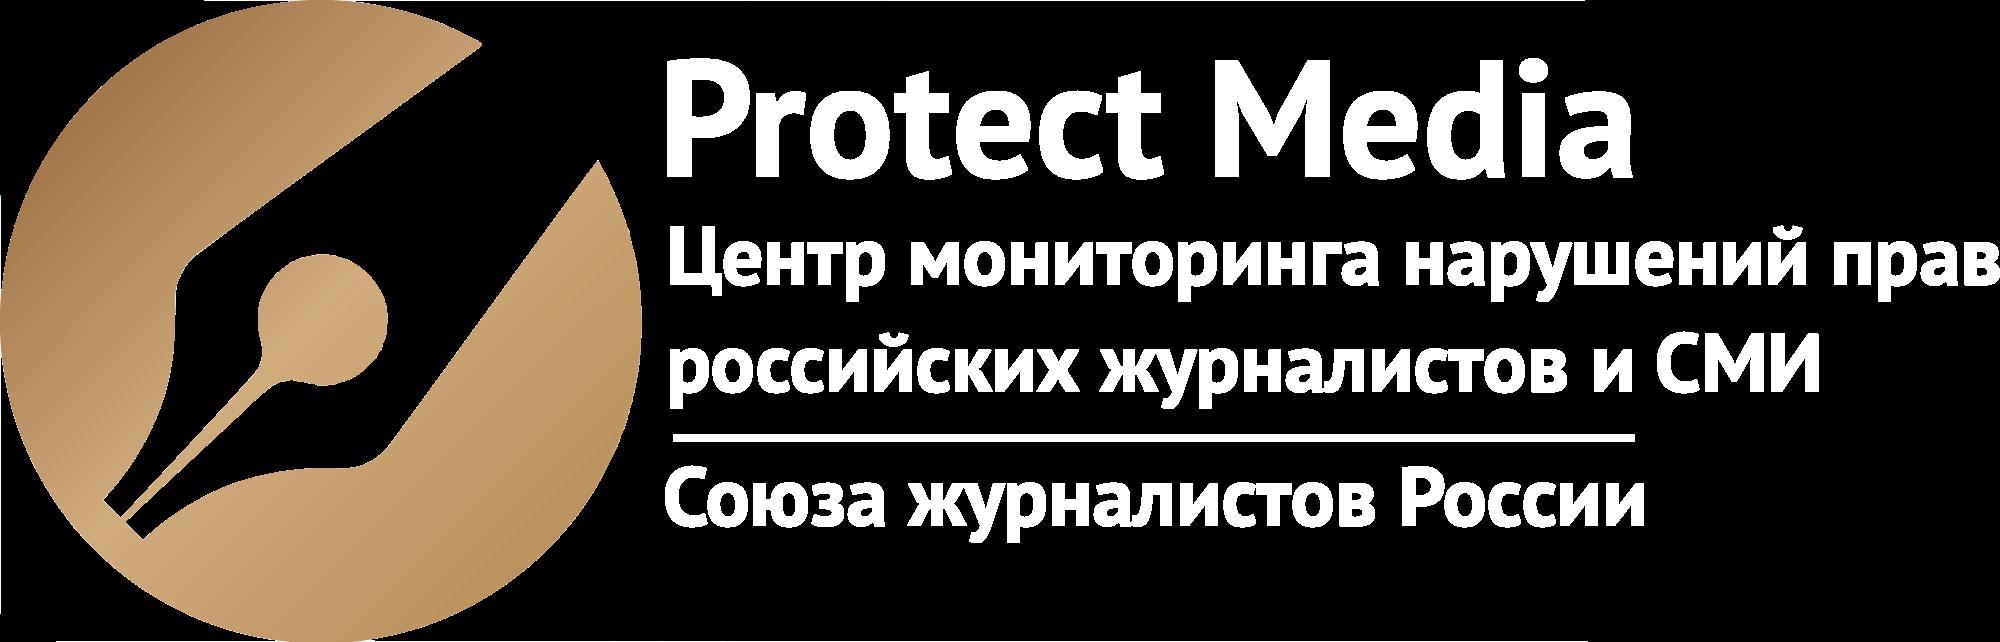 Protect Media